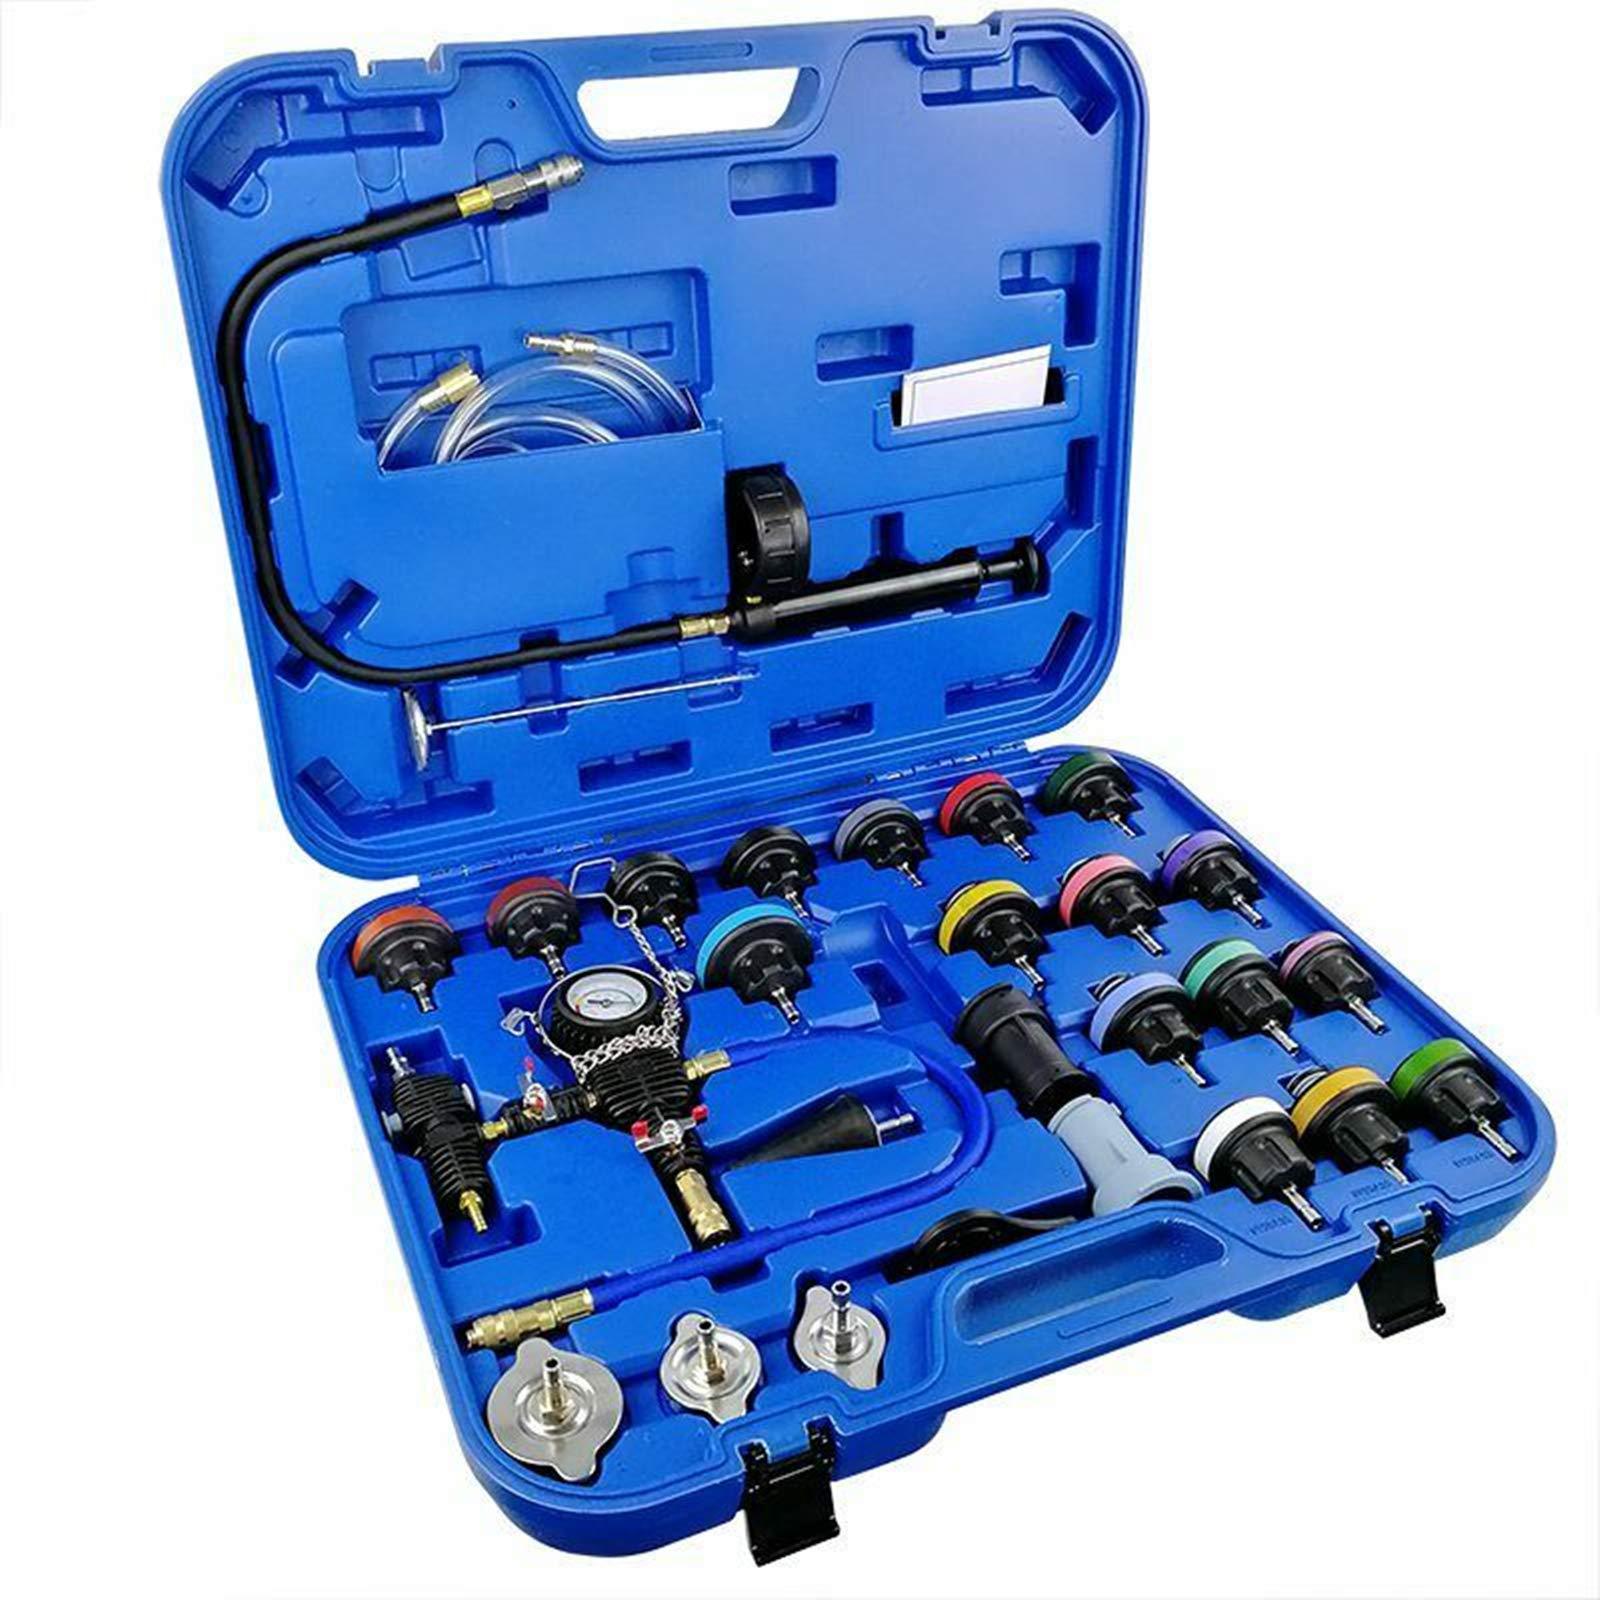 Mrcartool 28pcs Radiator Pressure Tester and Vacuum Type Cooling System Kit